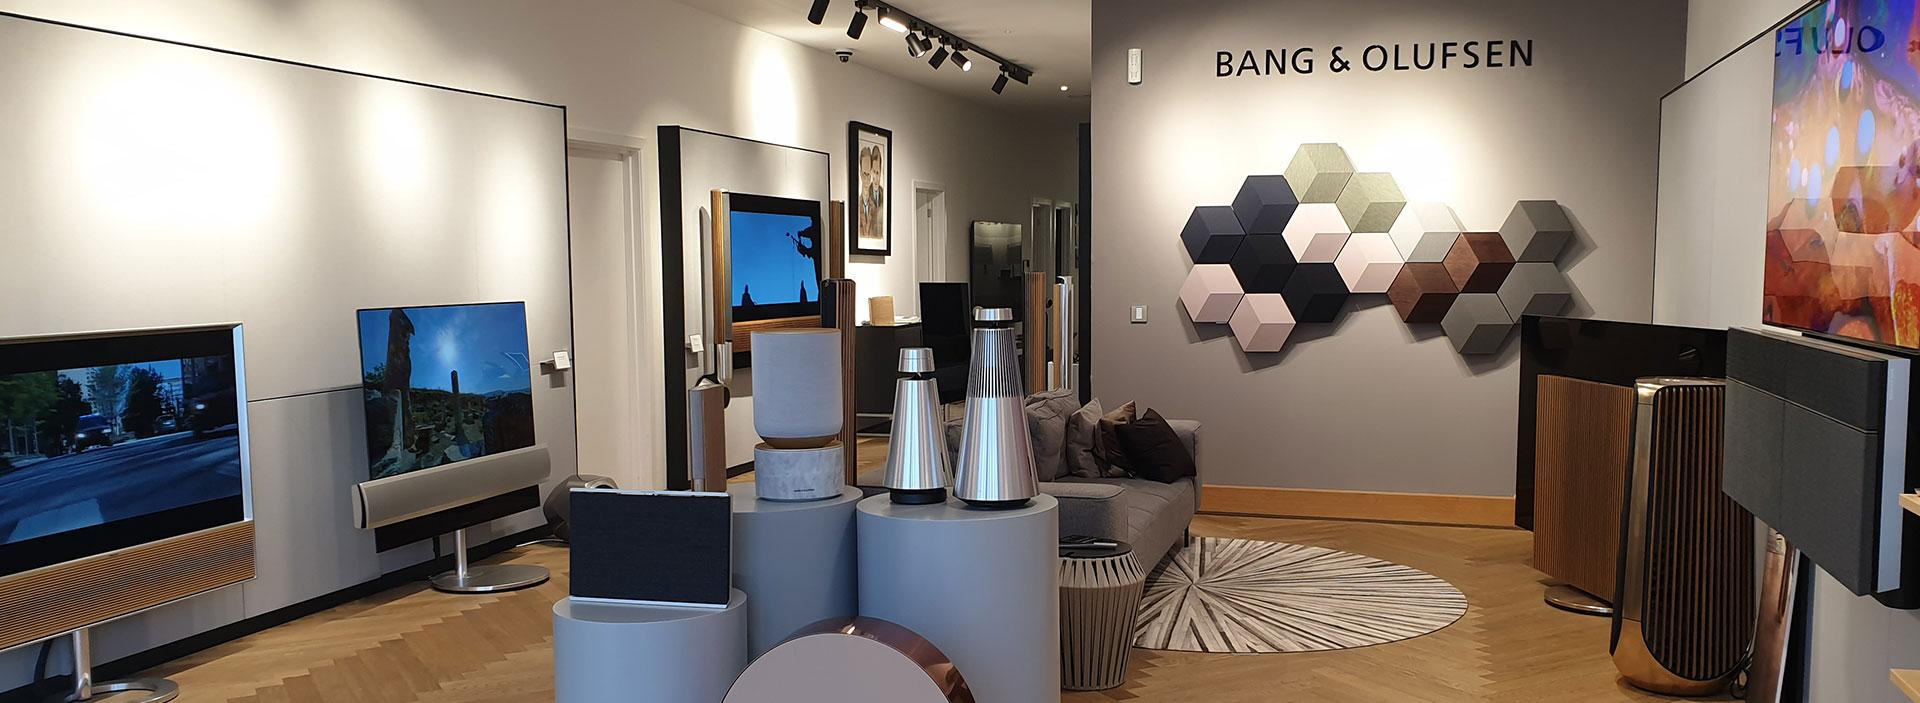 Bollo Store Glasgow Bang & Olufsen